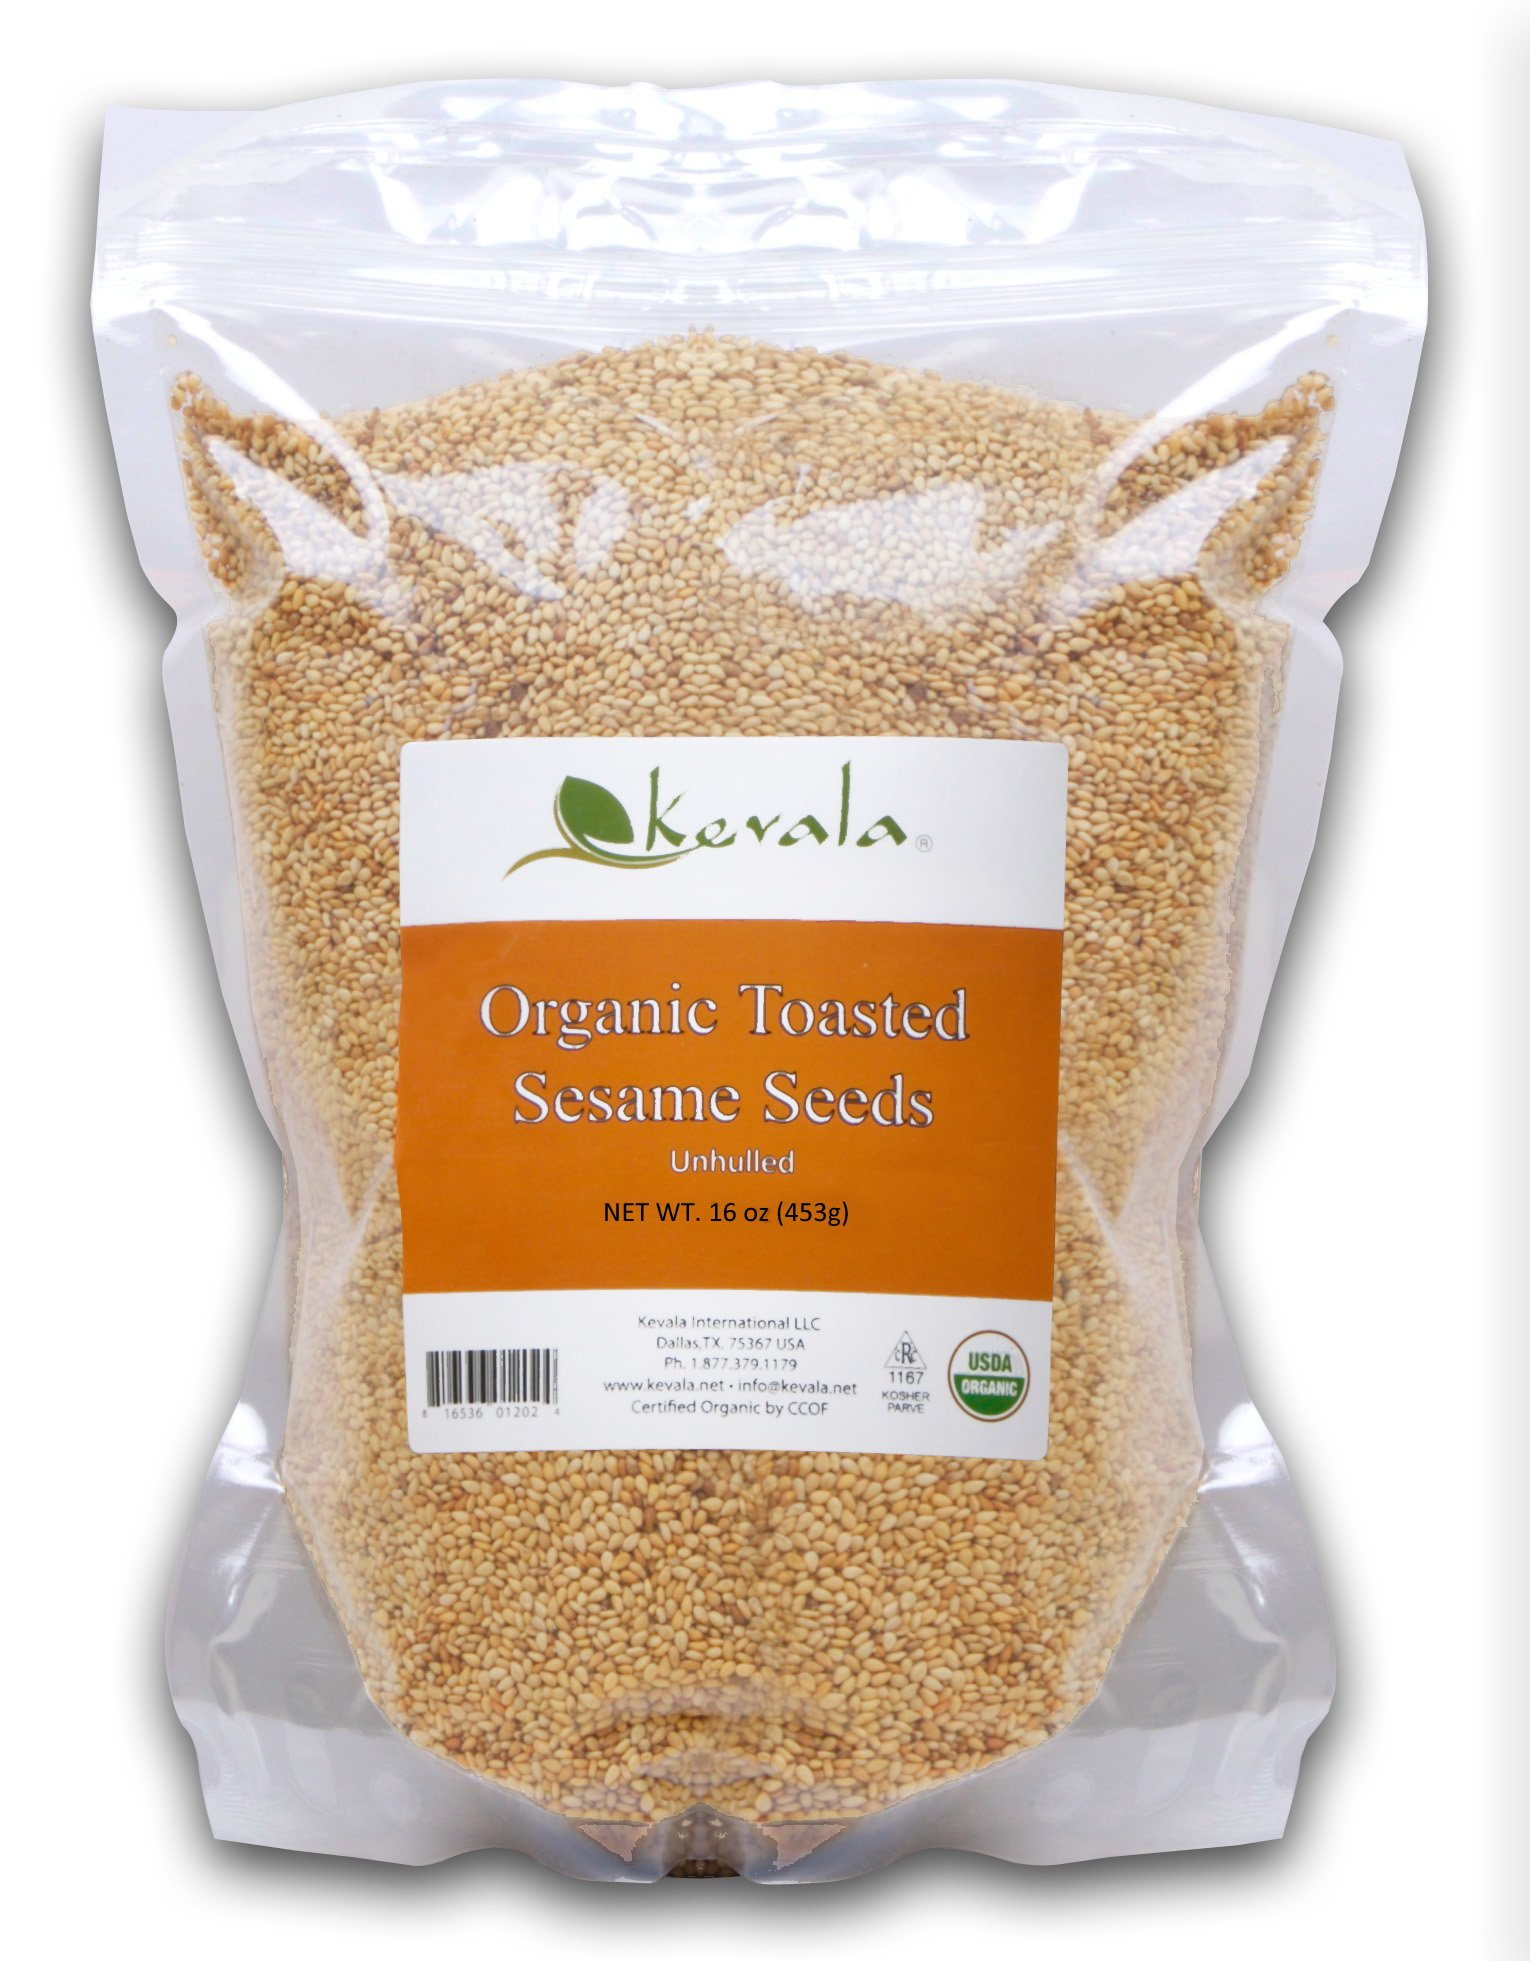 Kevala Organic Toasted Sesame Seeds 1Lb